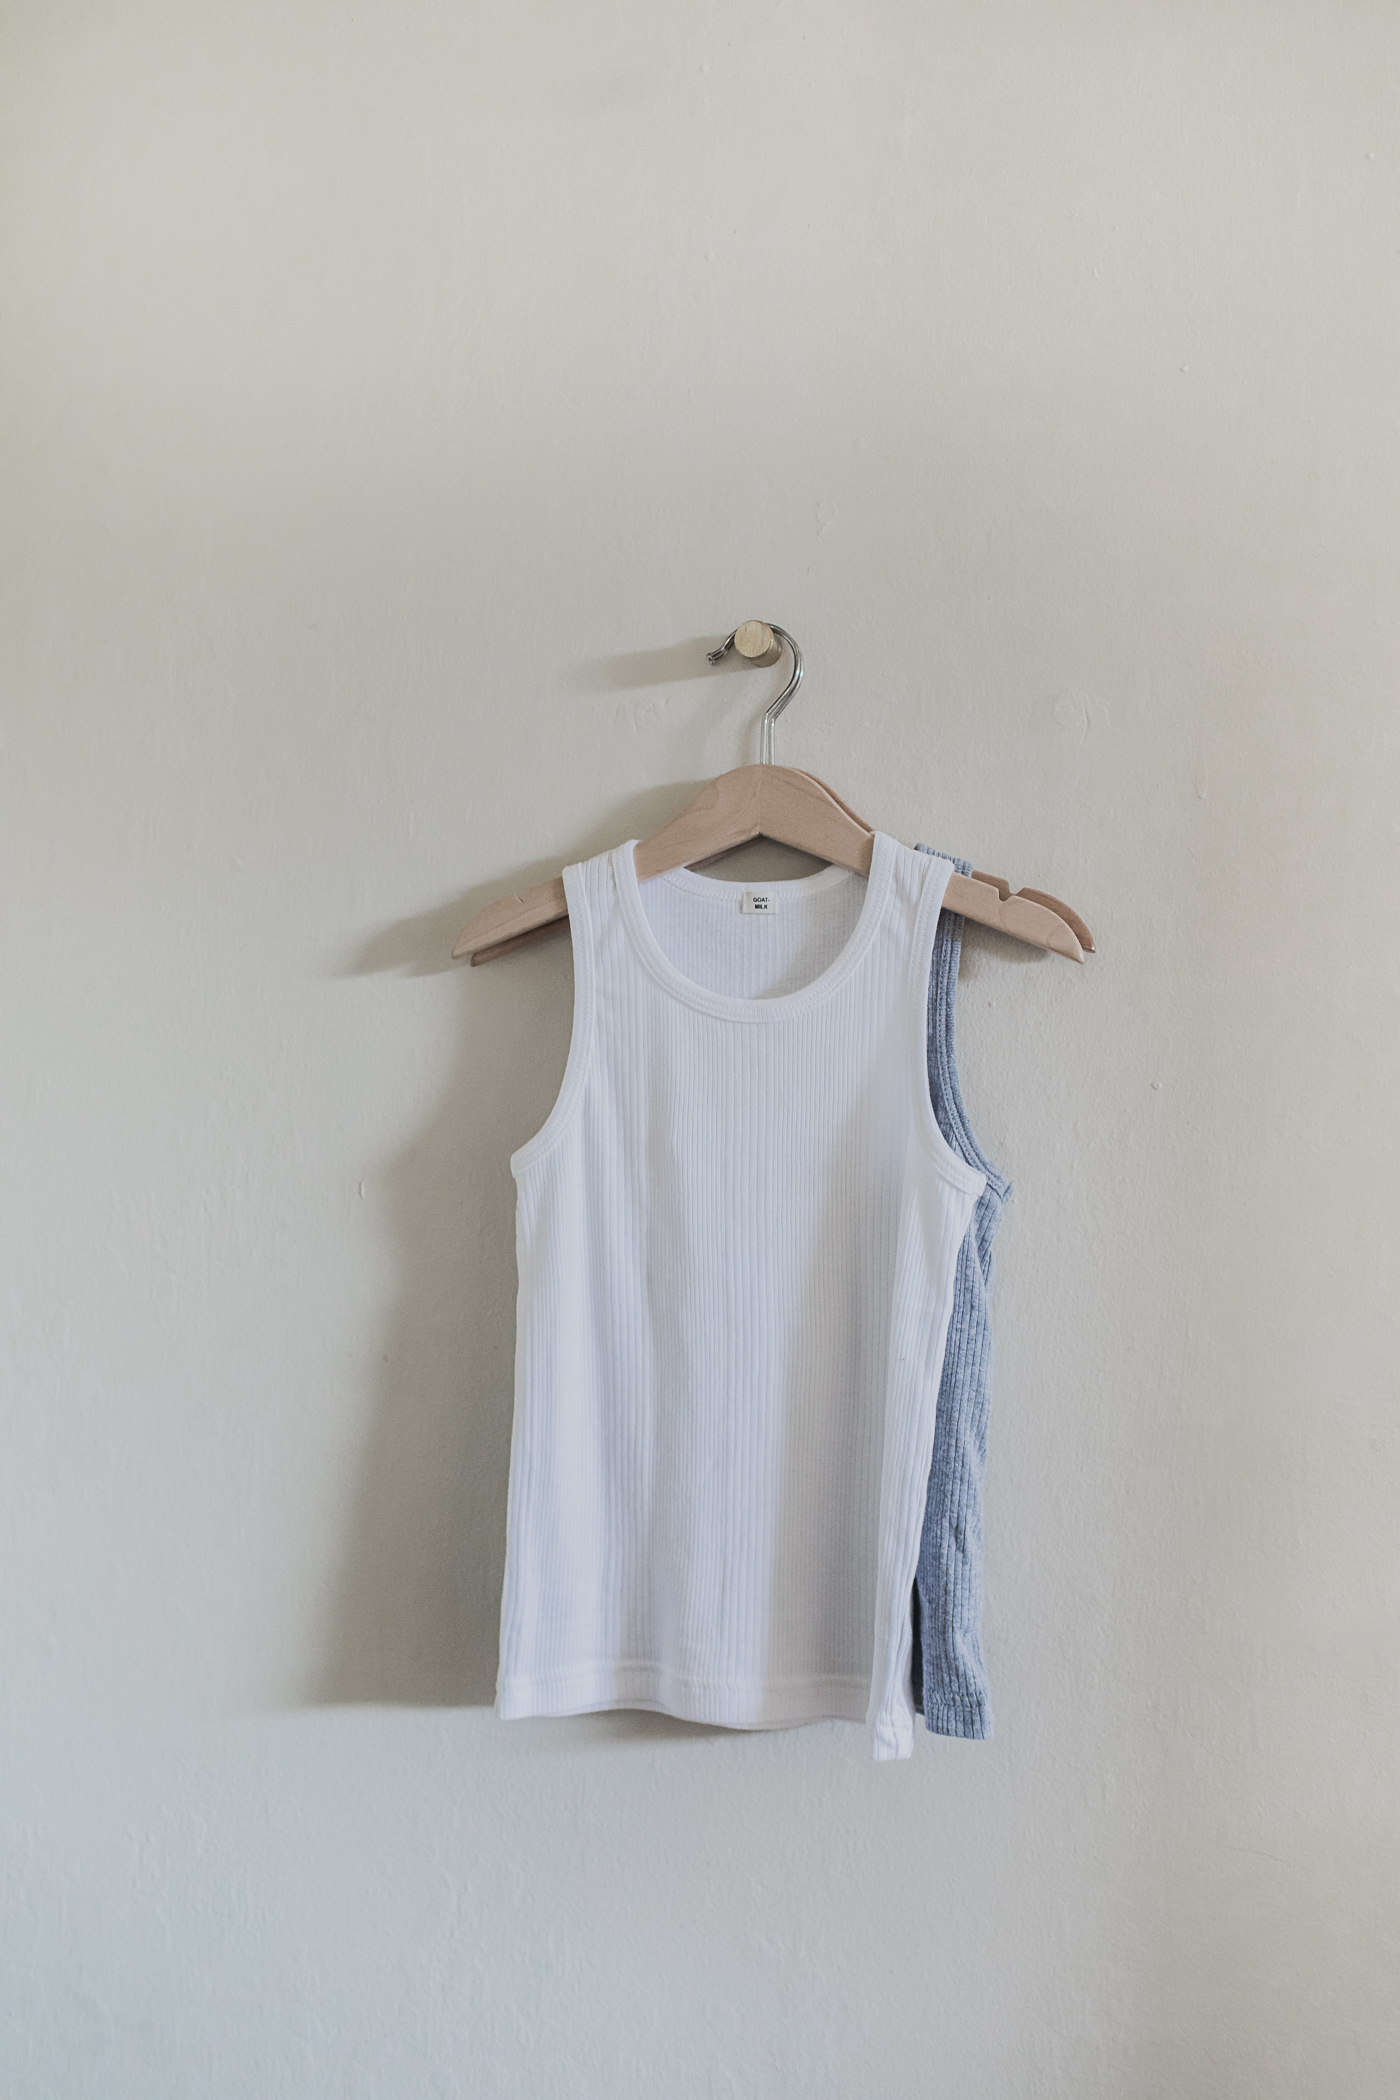 Create A Capsule Wardrobe For Kids